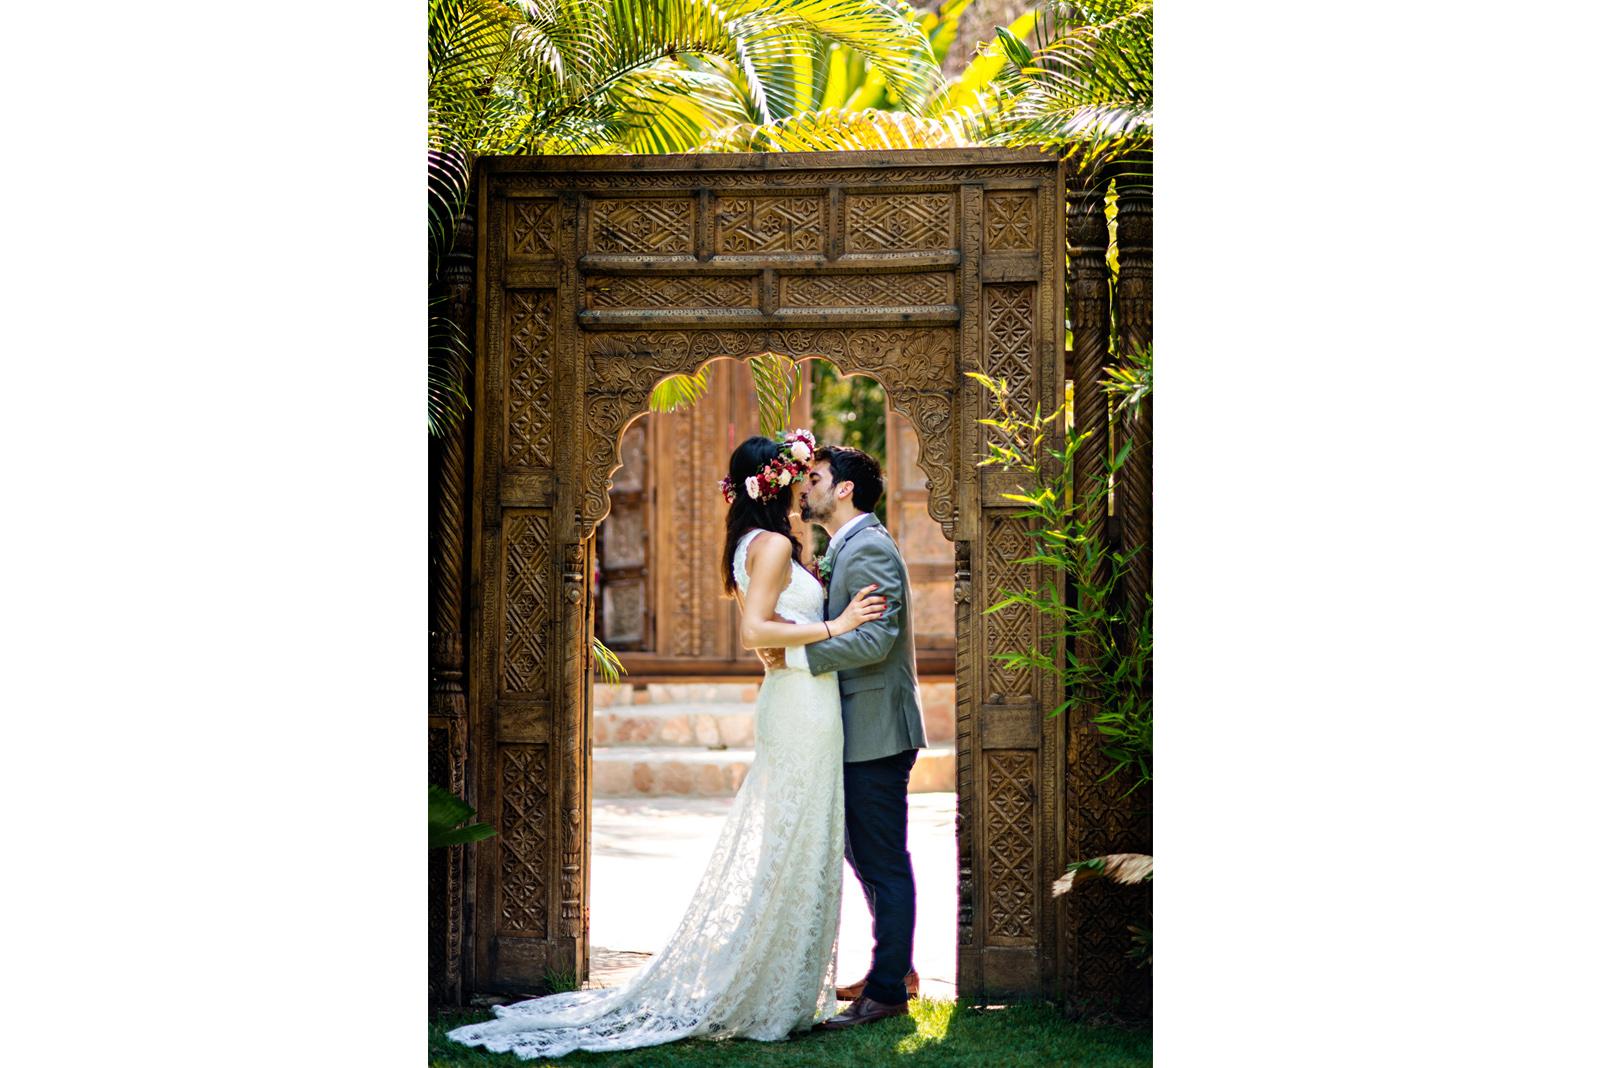 Villa-amor-sayulita-destination-wedding-mexico-010